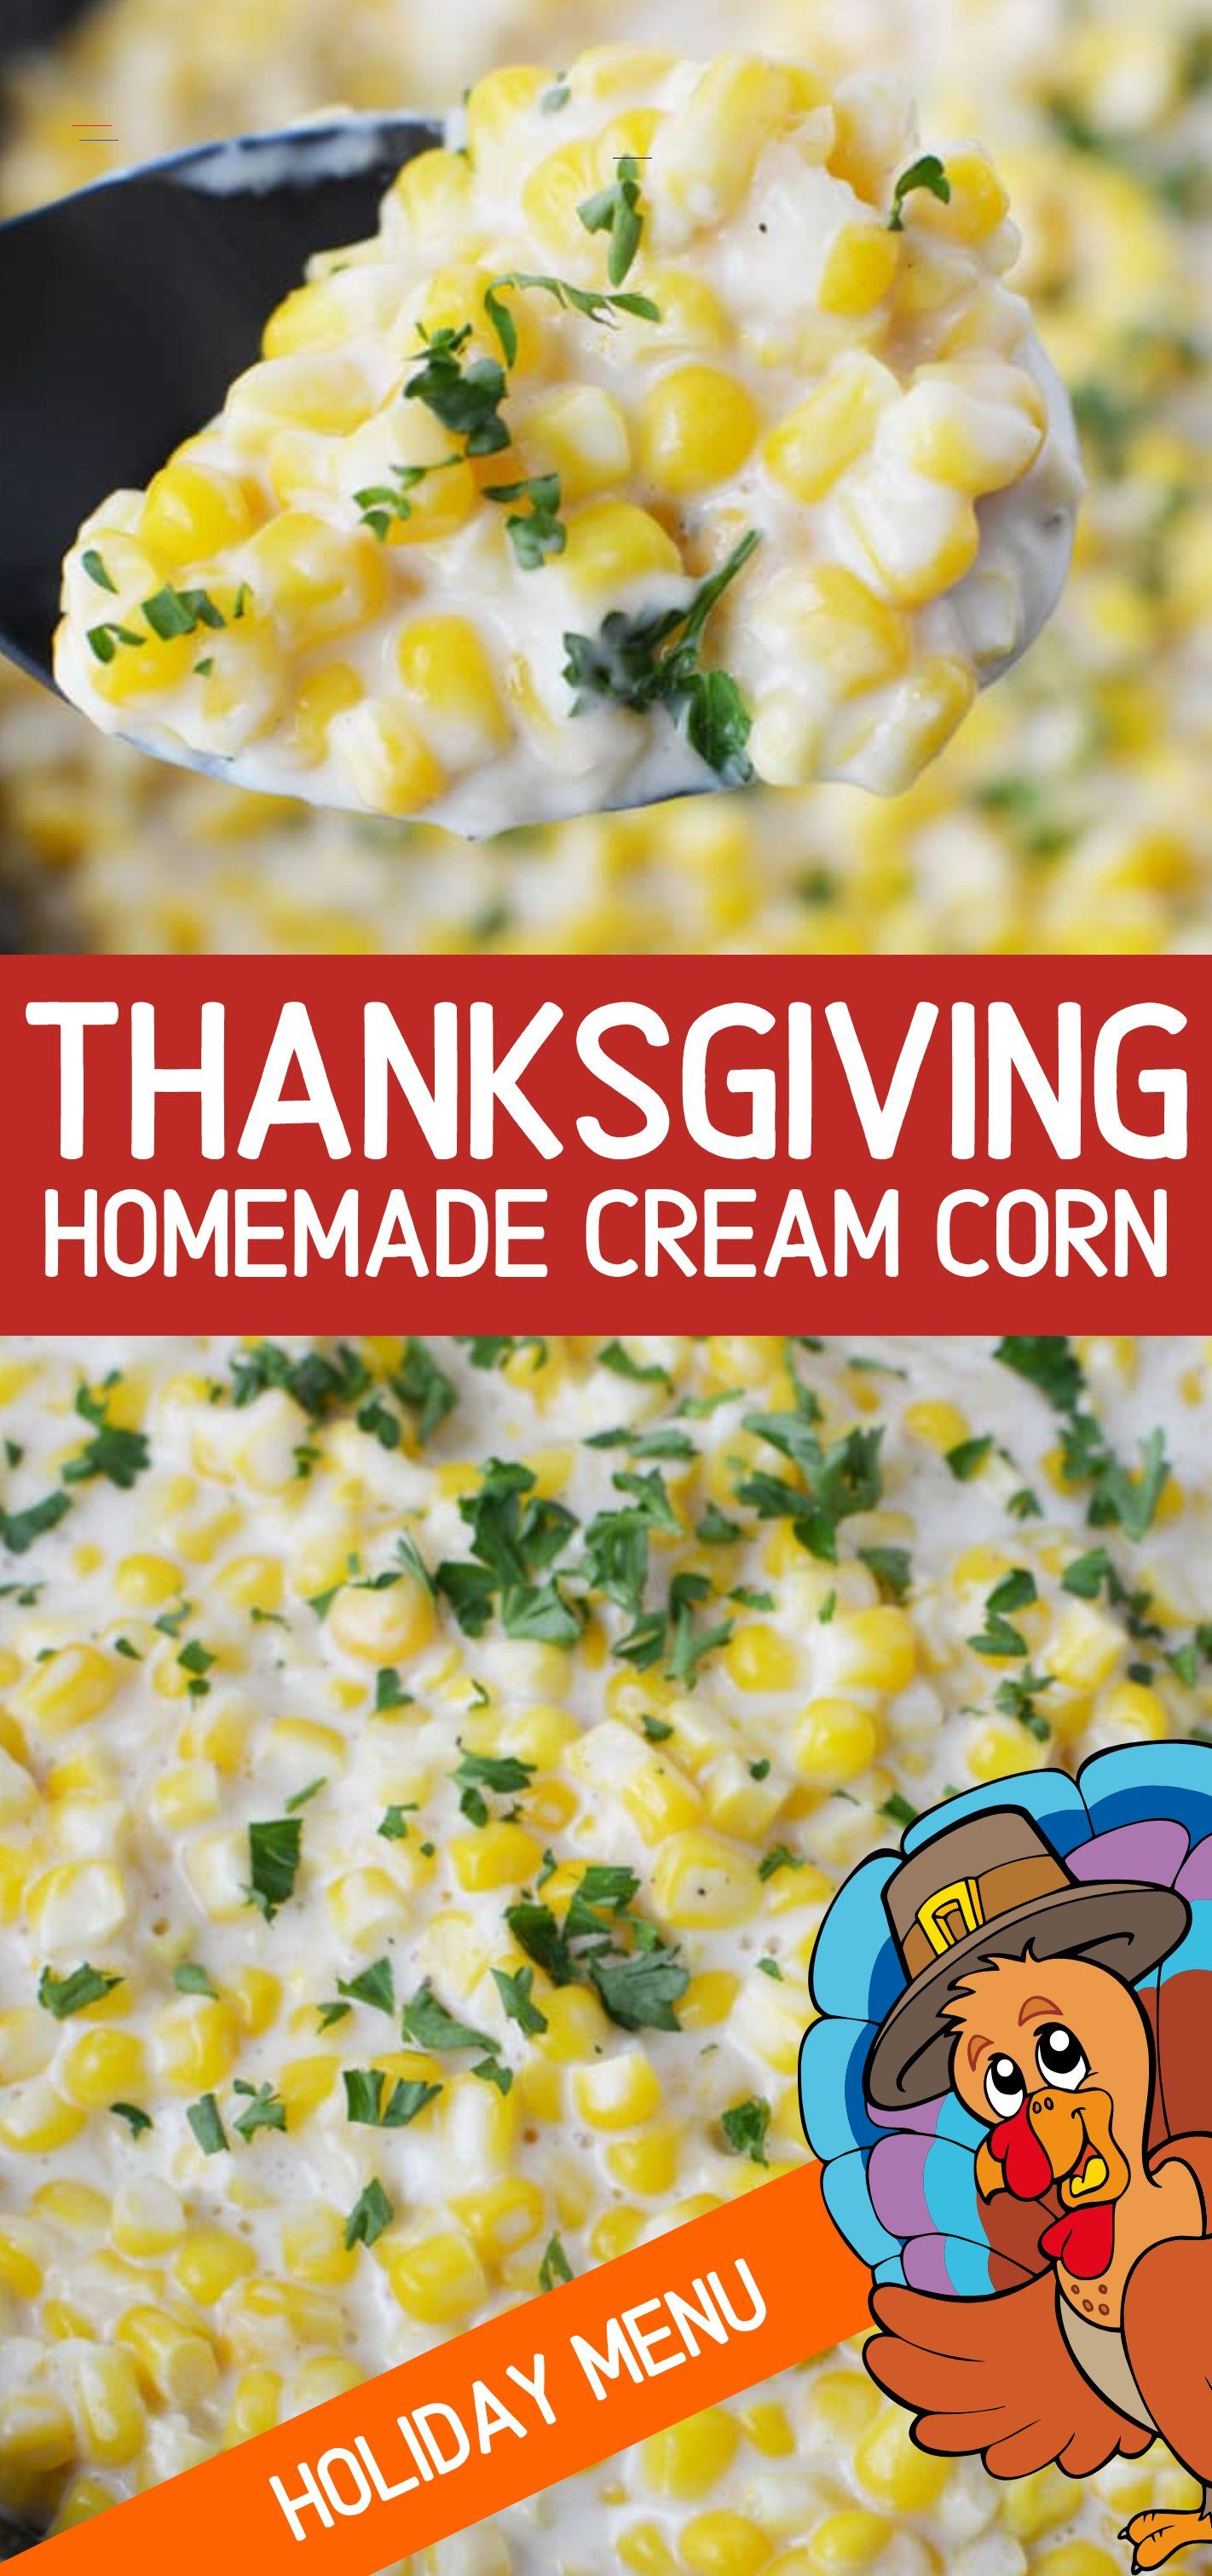 Thanksgiving Cream Corn Recipe Thanksgivingsidedishes In 2020 Avondeten Thanksgiving Bijgerechten